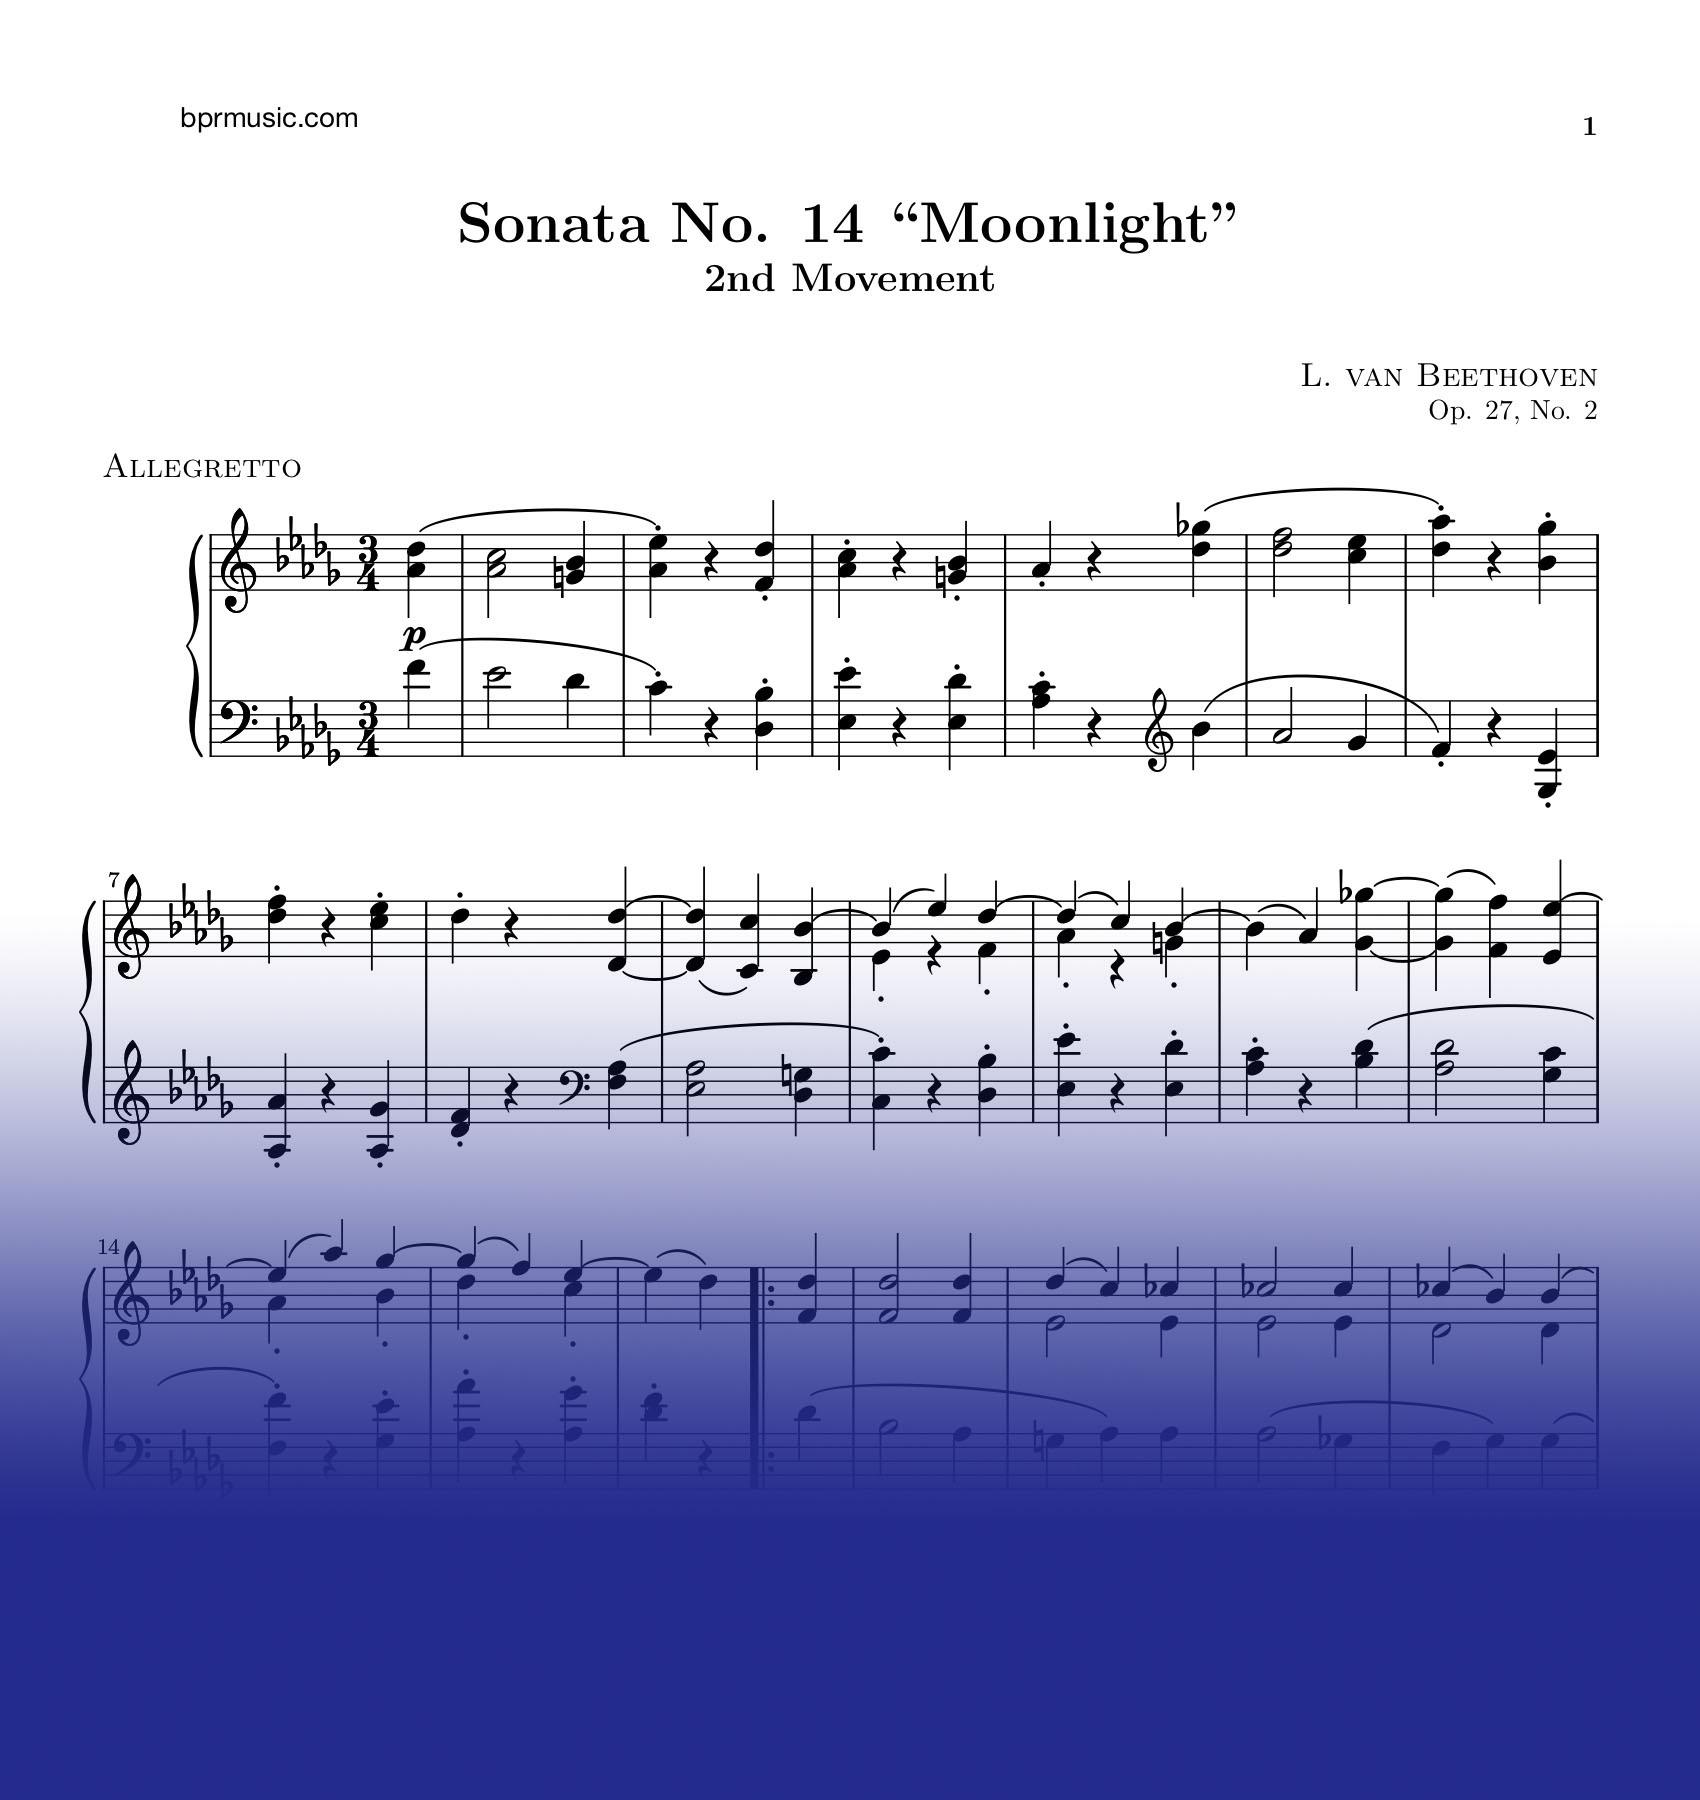 Moonlight Sonata 2nd movement — bprmusic com